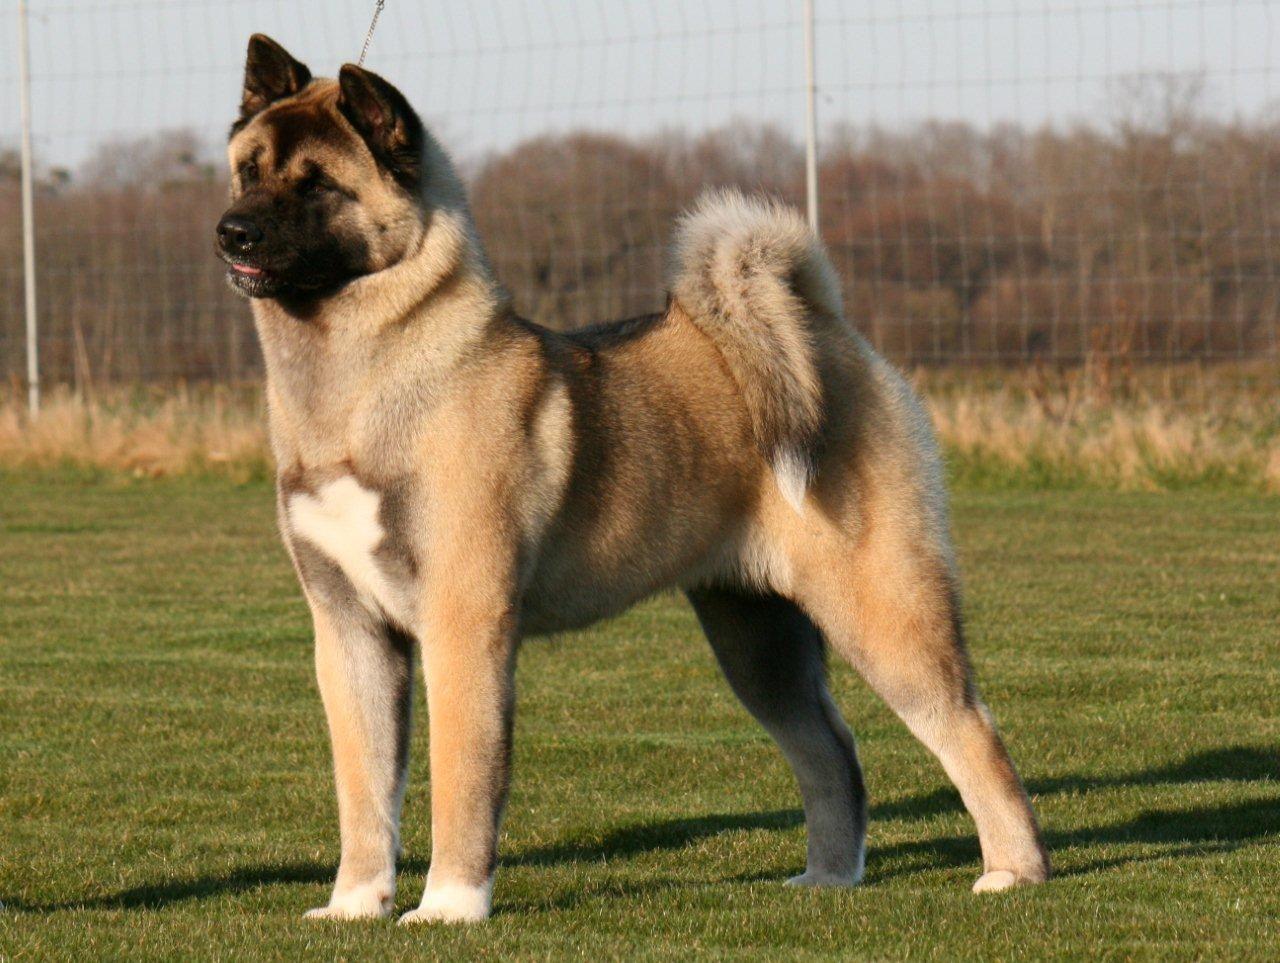 Fawn American Akita Dog Rocky Cachorros Akita Perro Akita Akita